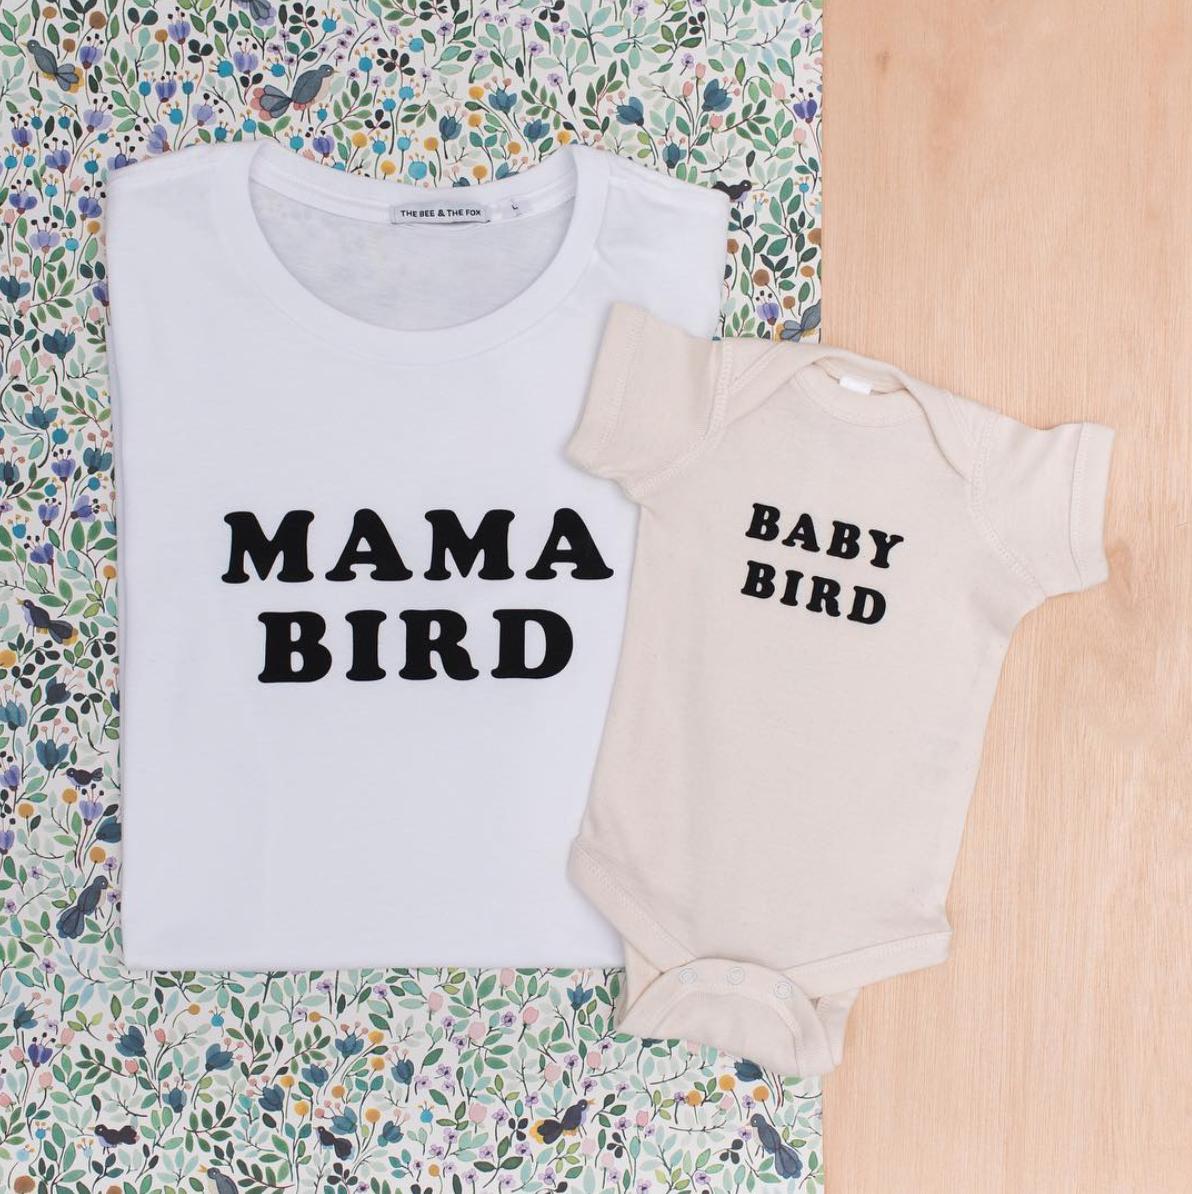 Mama Bird tee and Baby Bird Onesie